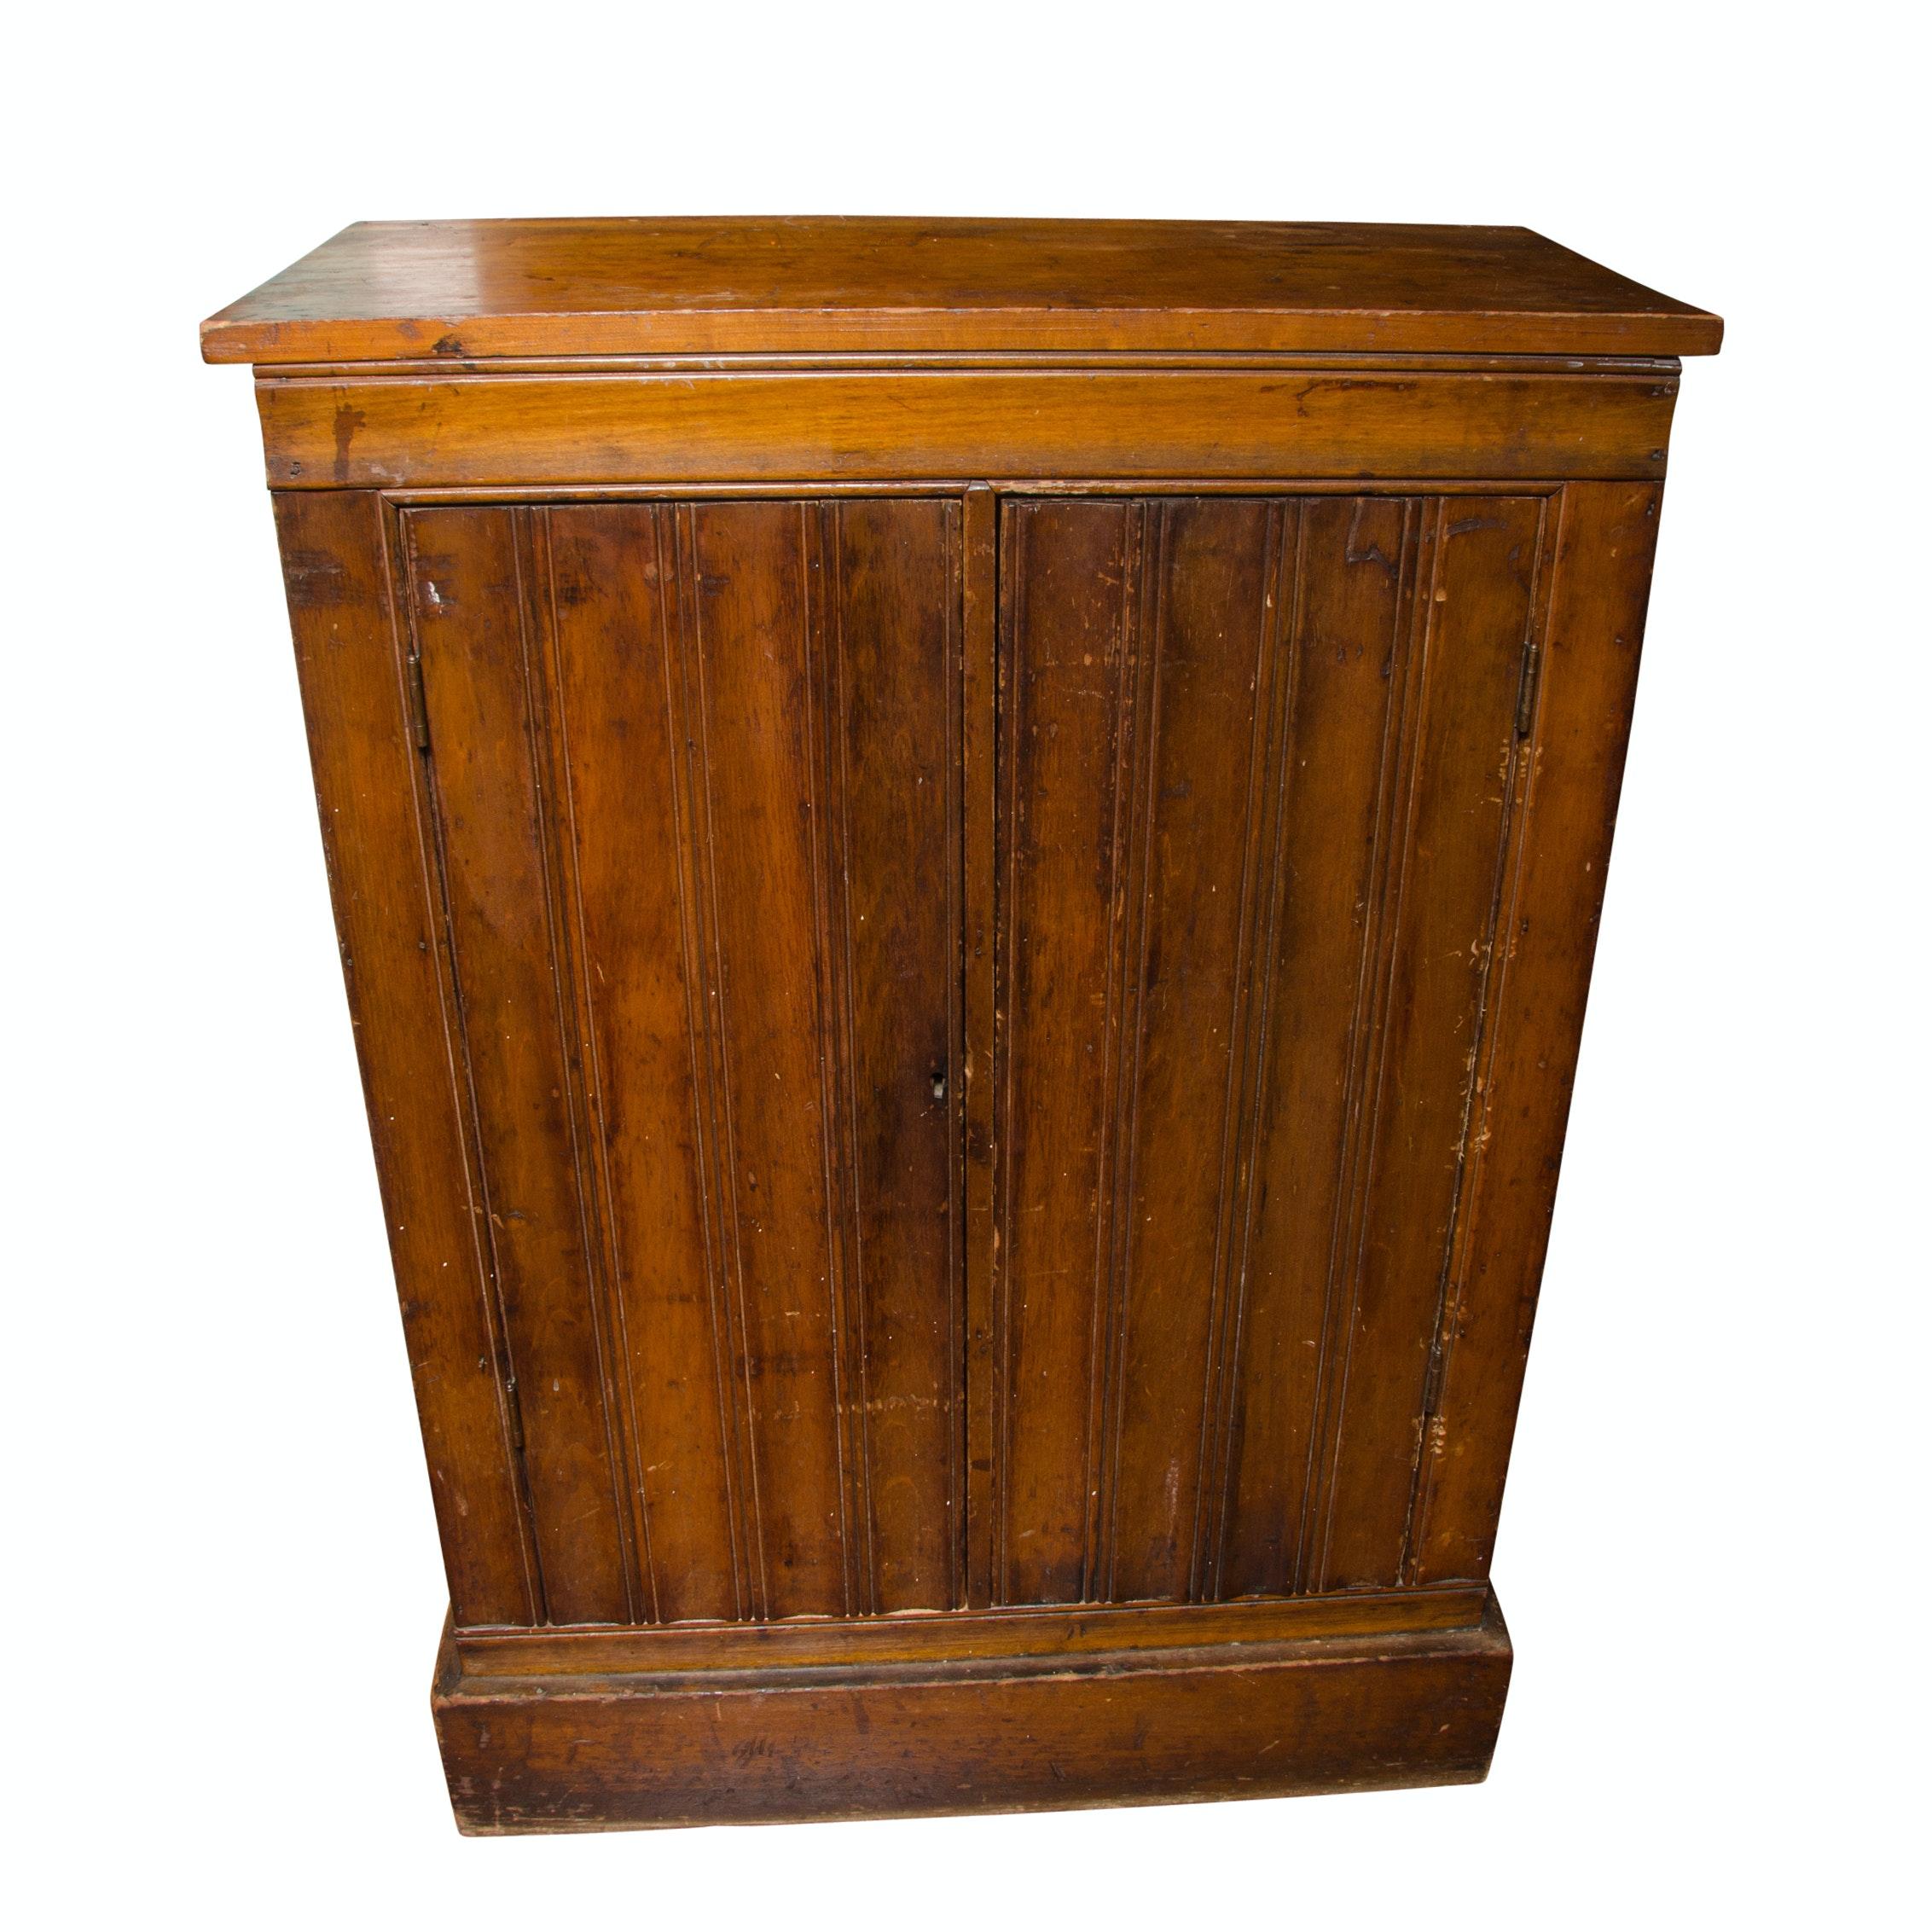 Vintage Pine Wood Cabinet